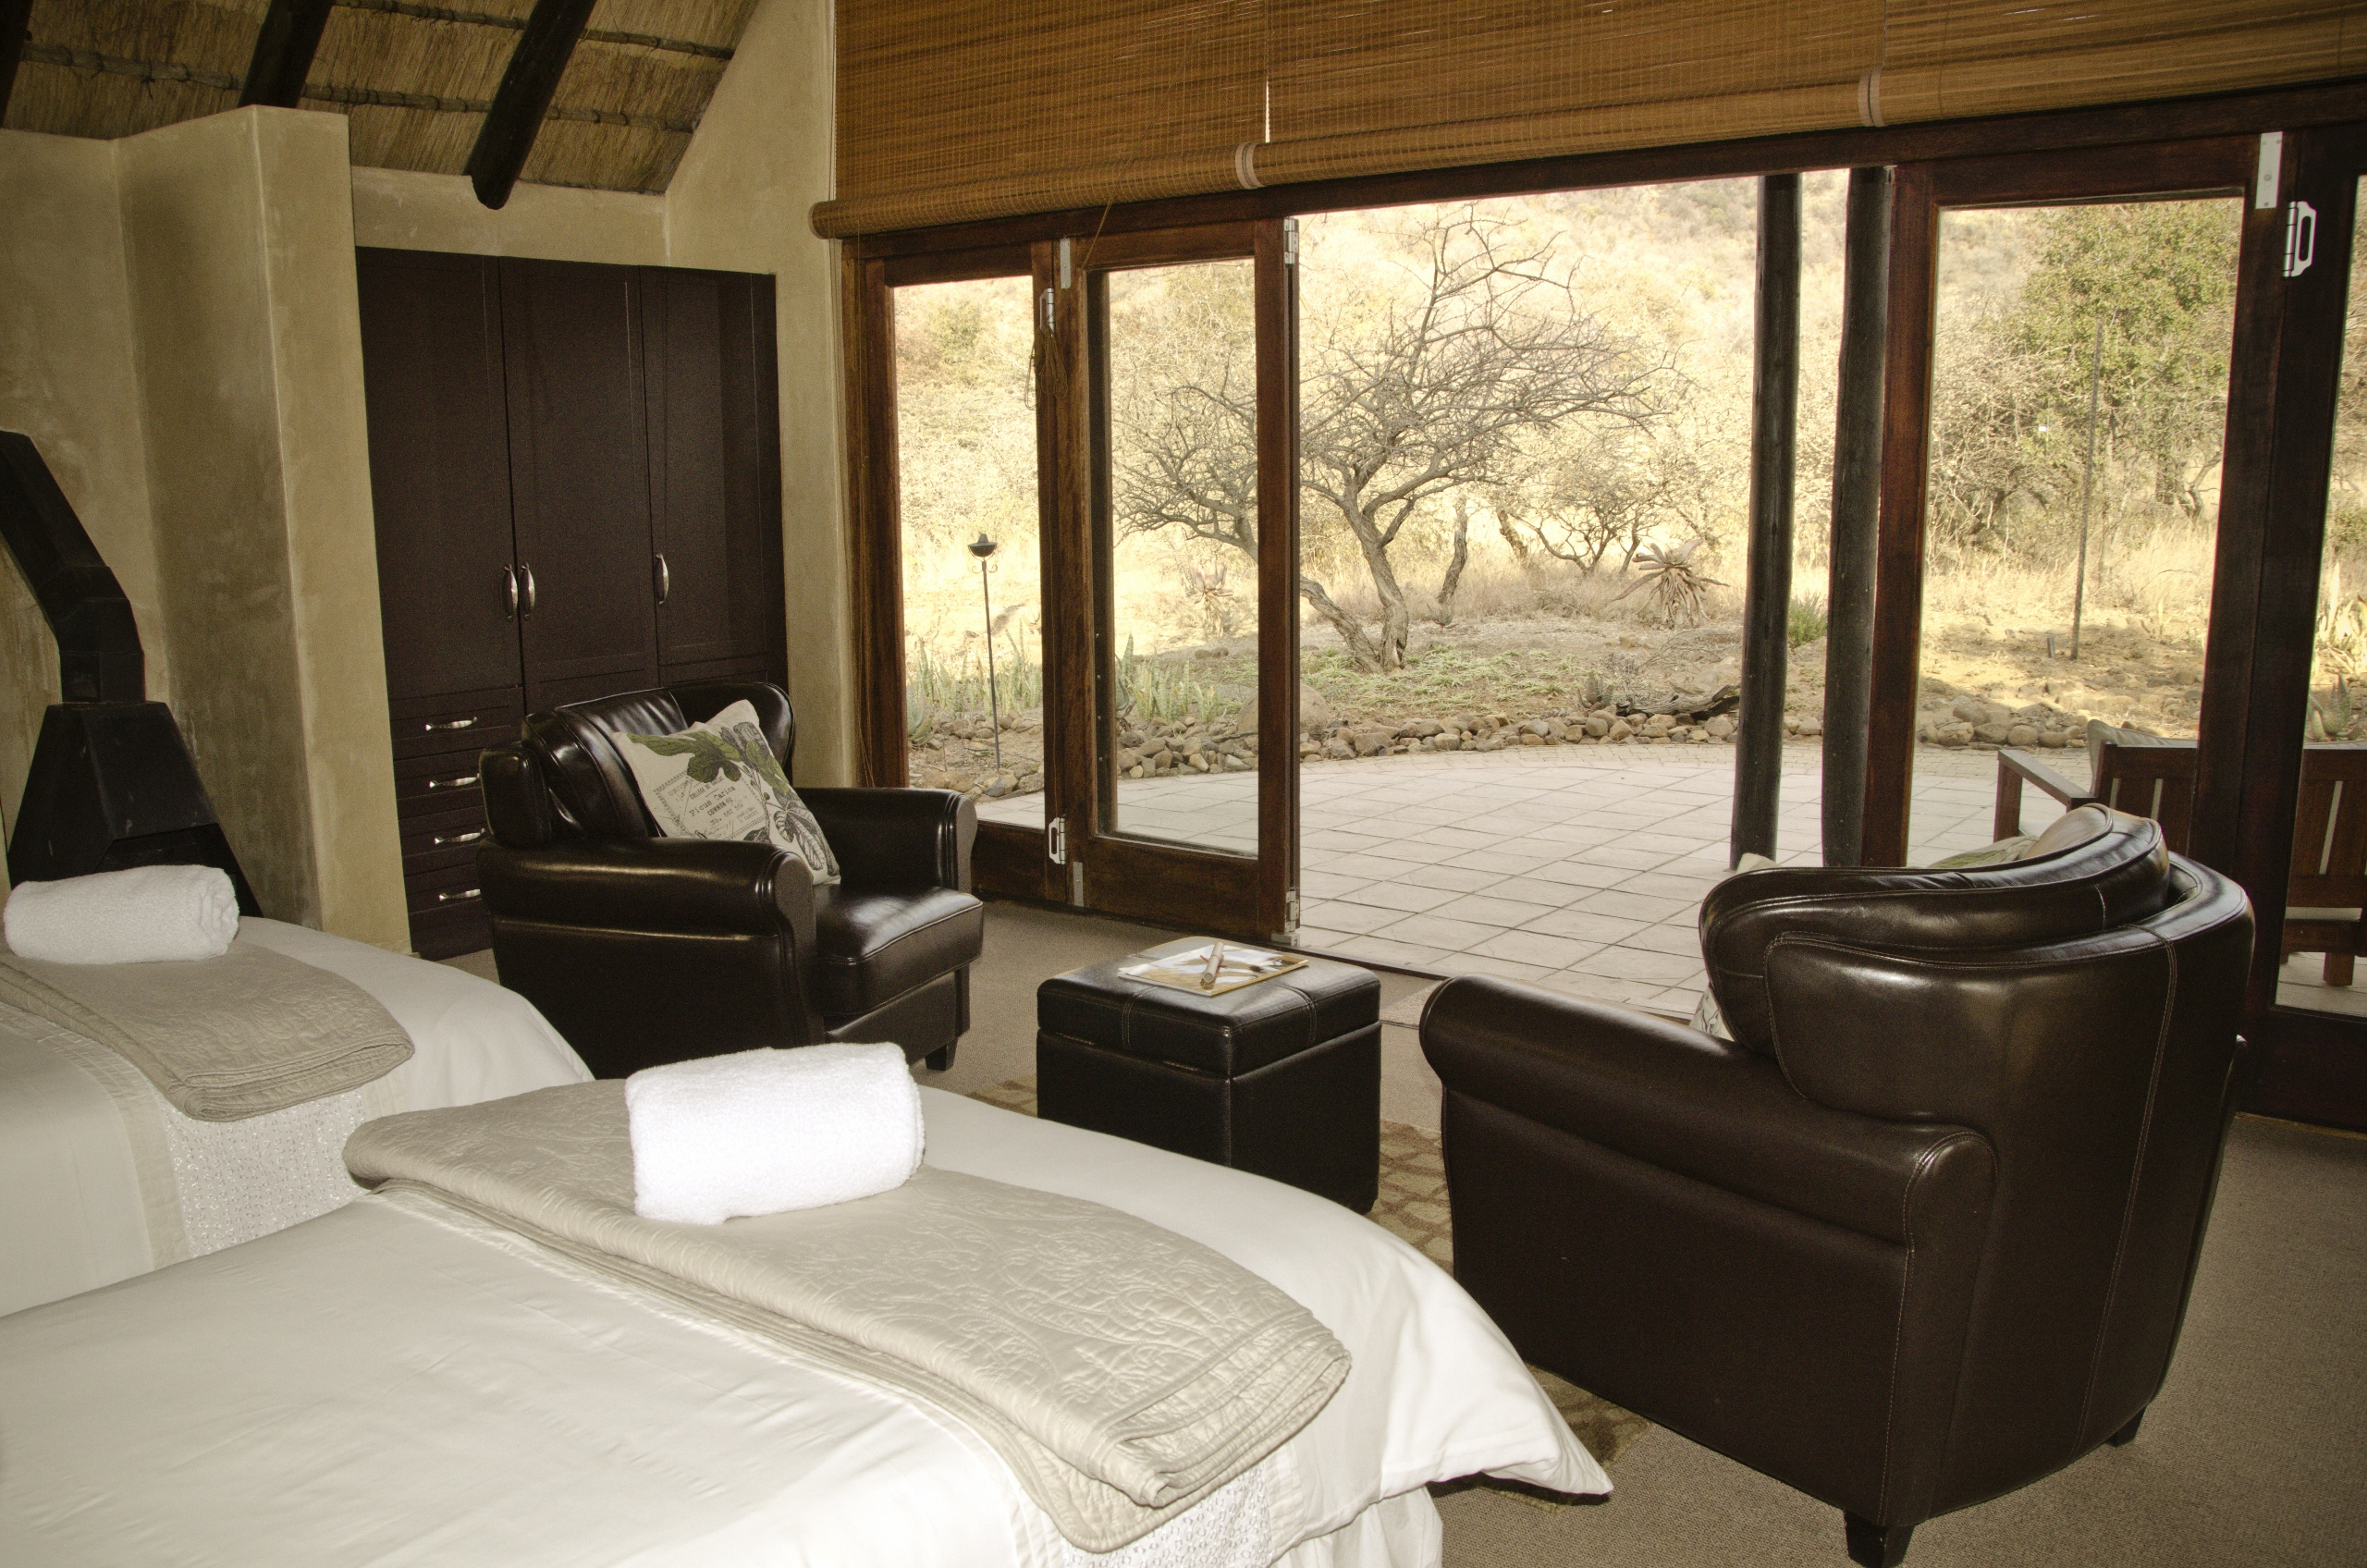 Morokolo Safari Lodge, Bojanala